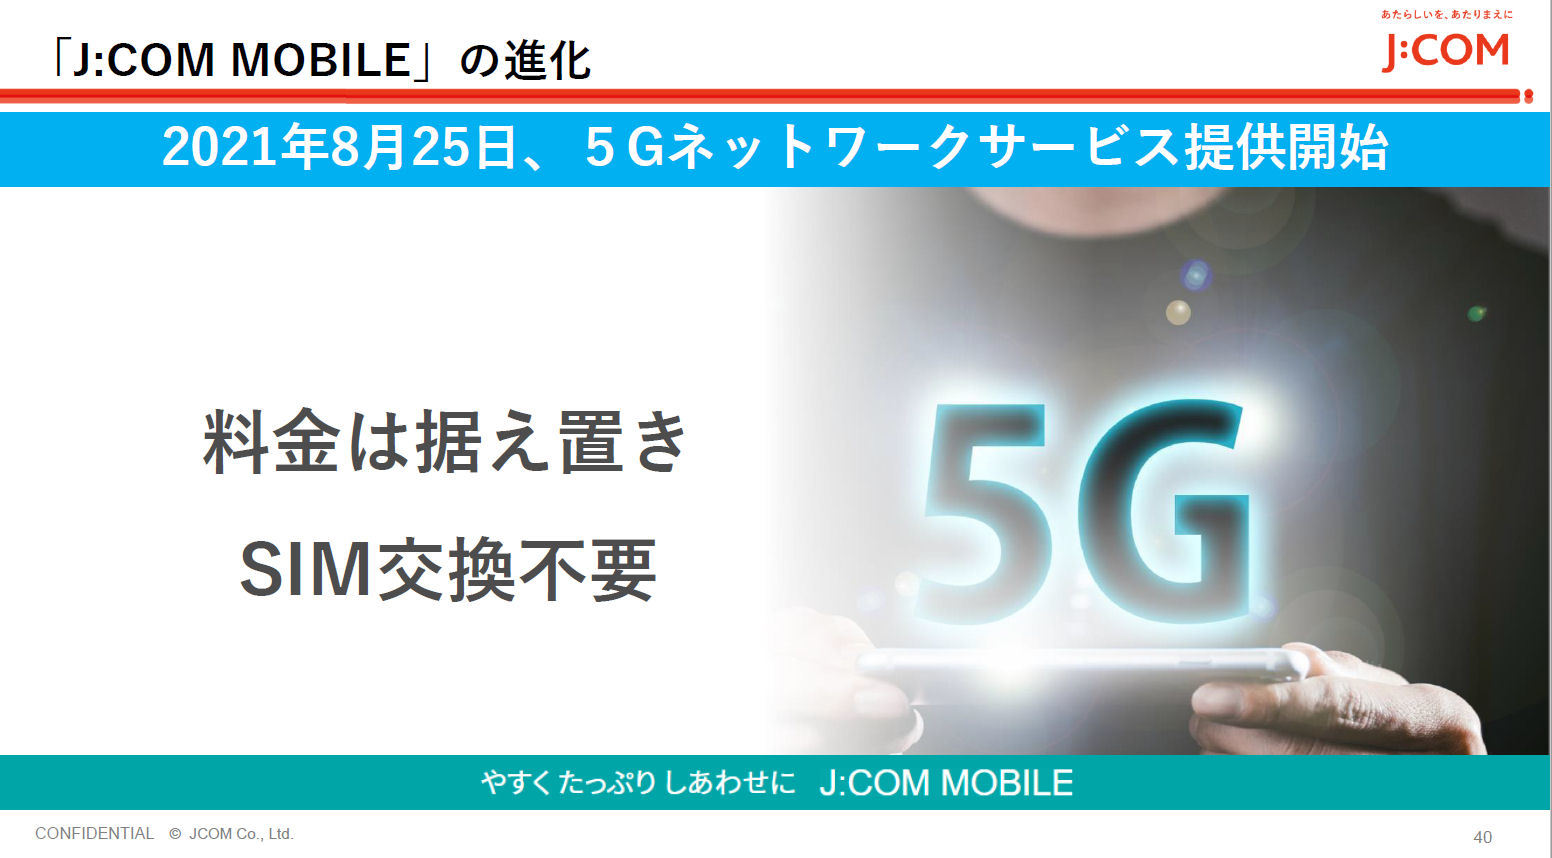 「J:COM MOBILE」で8月から5Gサービス提供 料金据え置き、SIM交換不要 - ITmedia Mobile